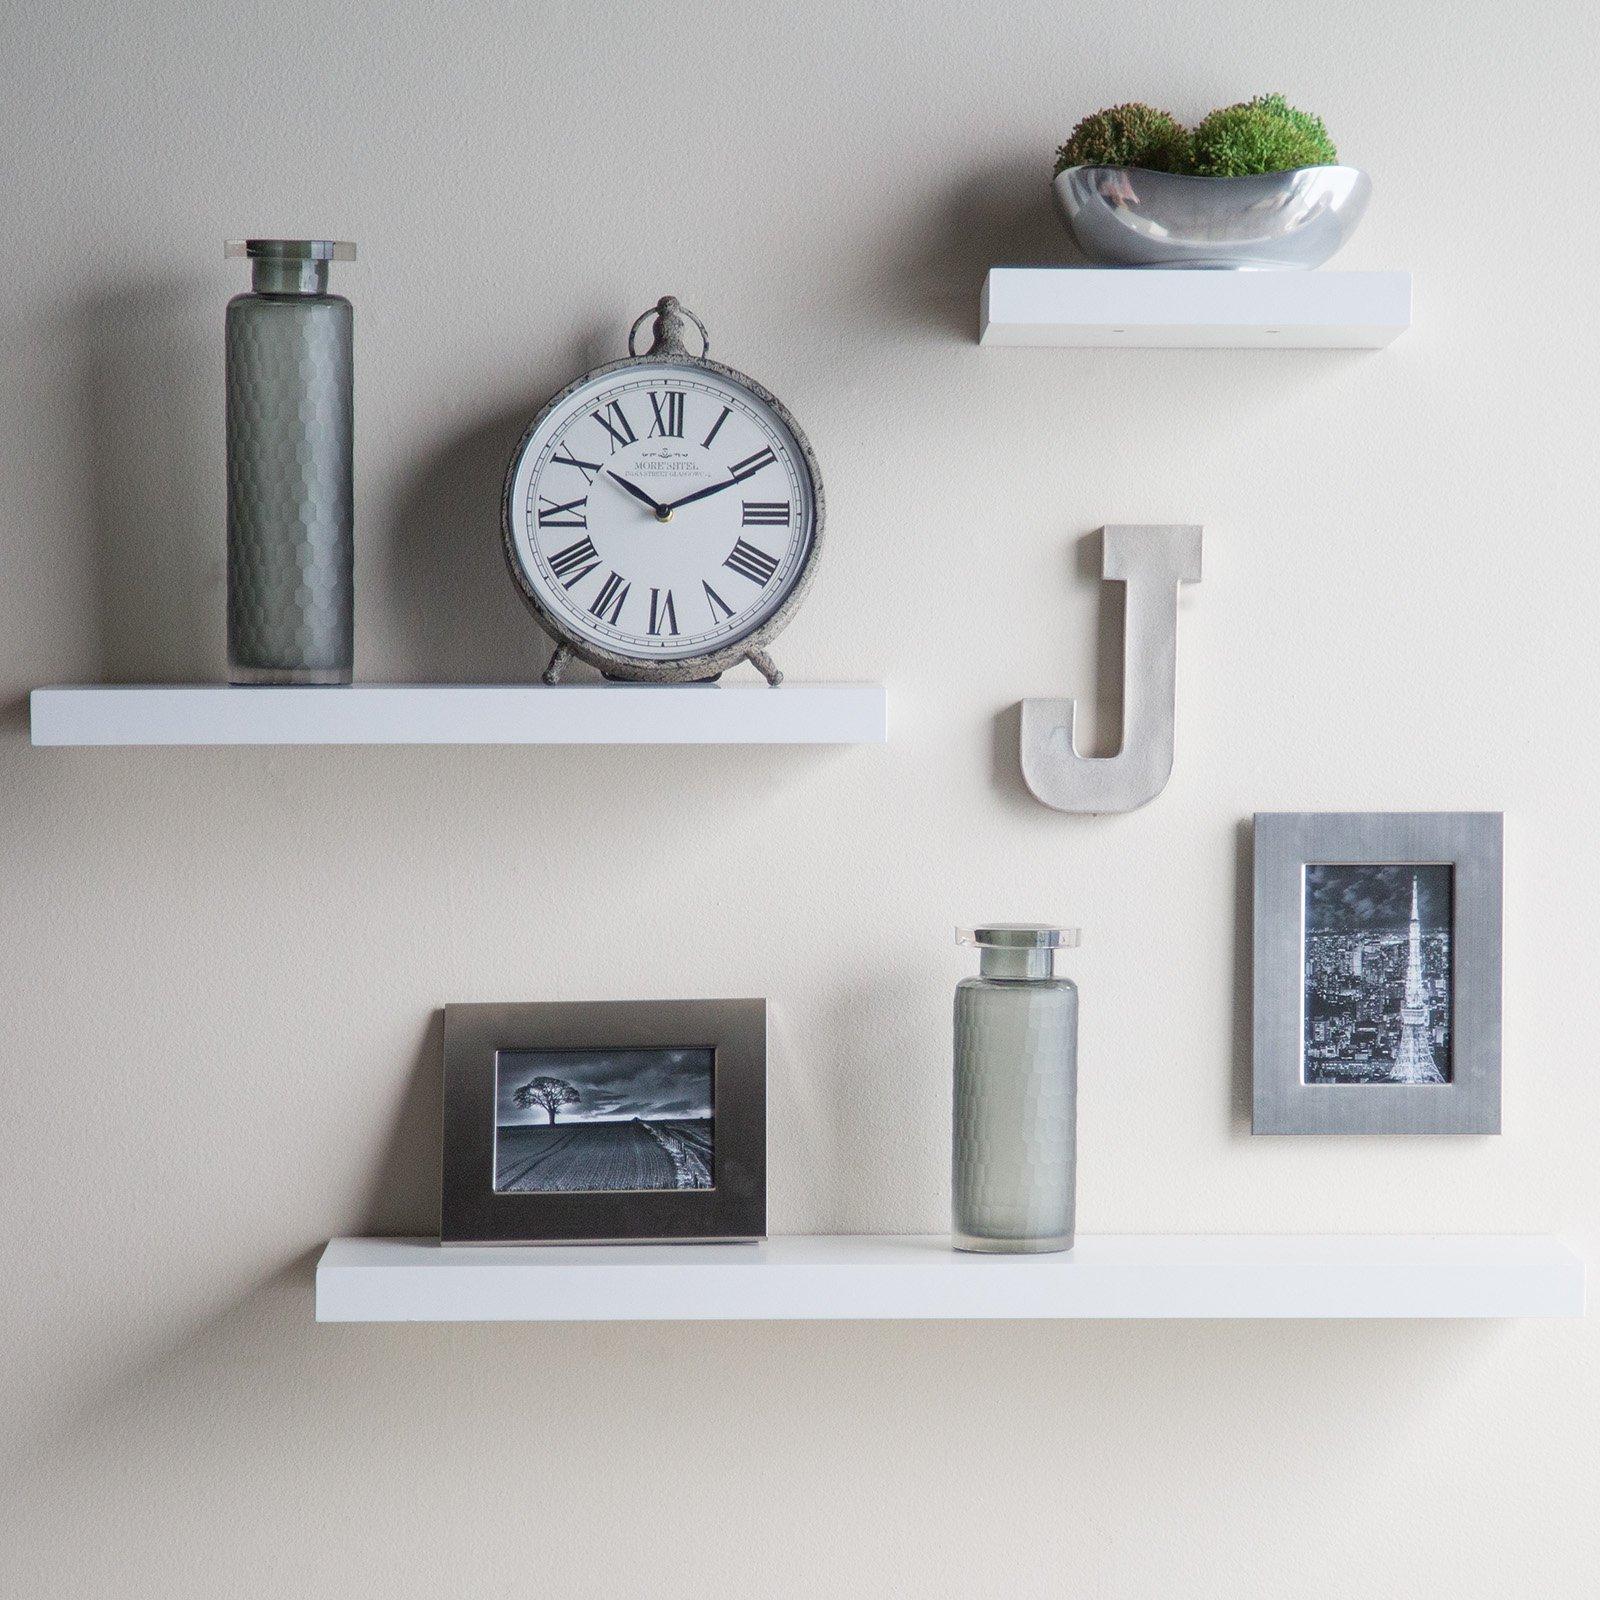 White Floating Wall Shelves Decor Ideas